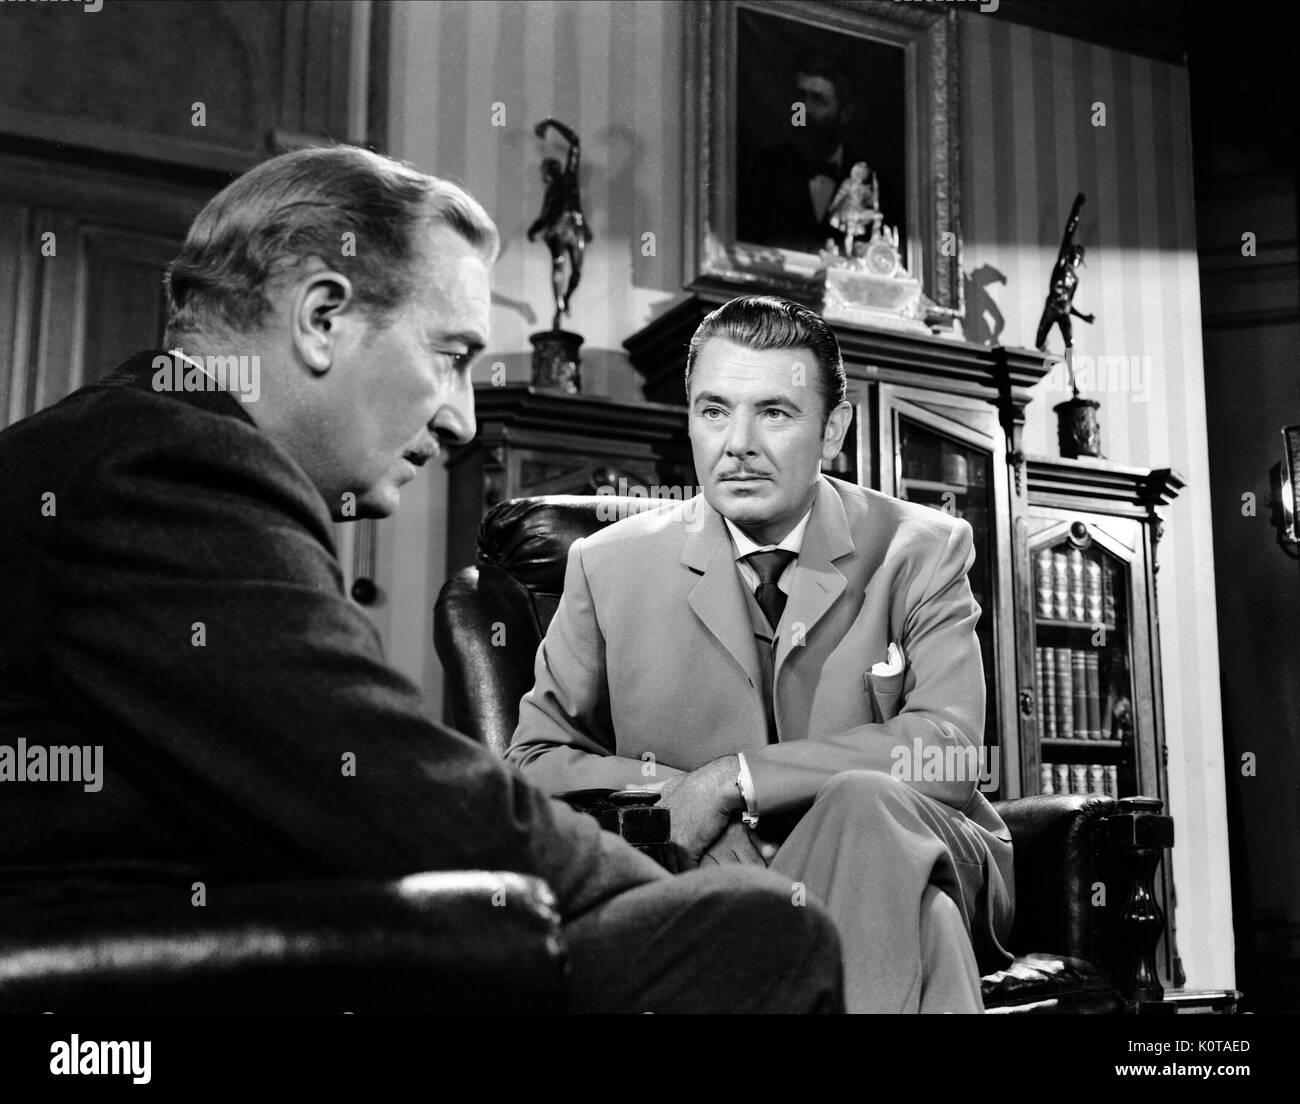 PAUL LUKAS & GEORGE BRENT EXPERIMENT PERILOUS (1944) Stockbild